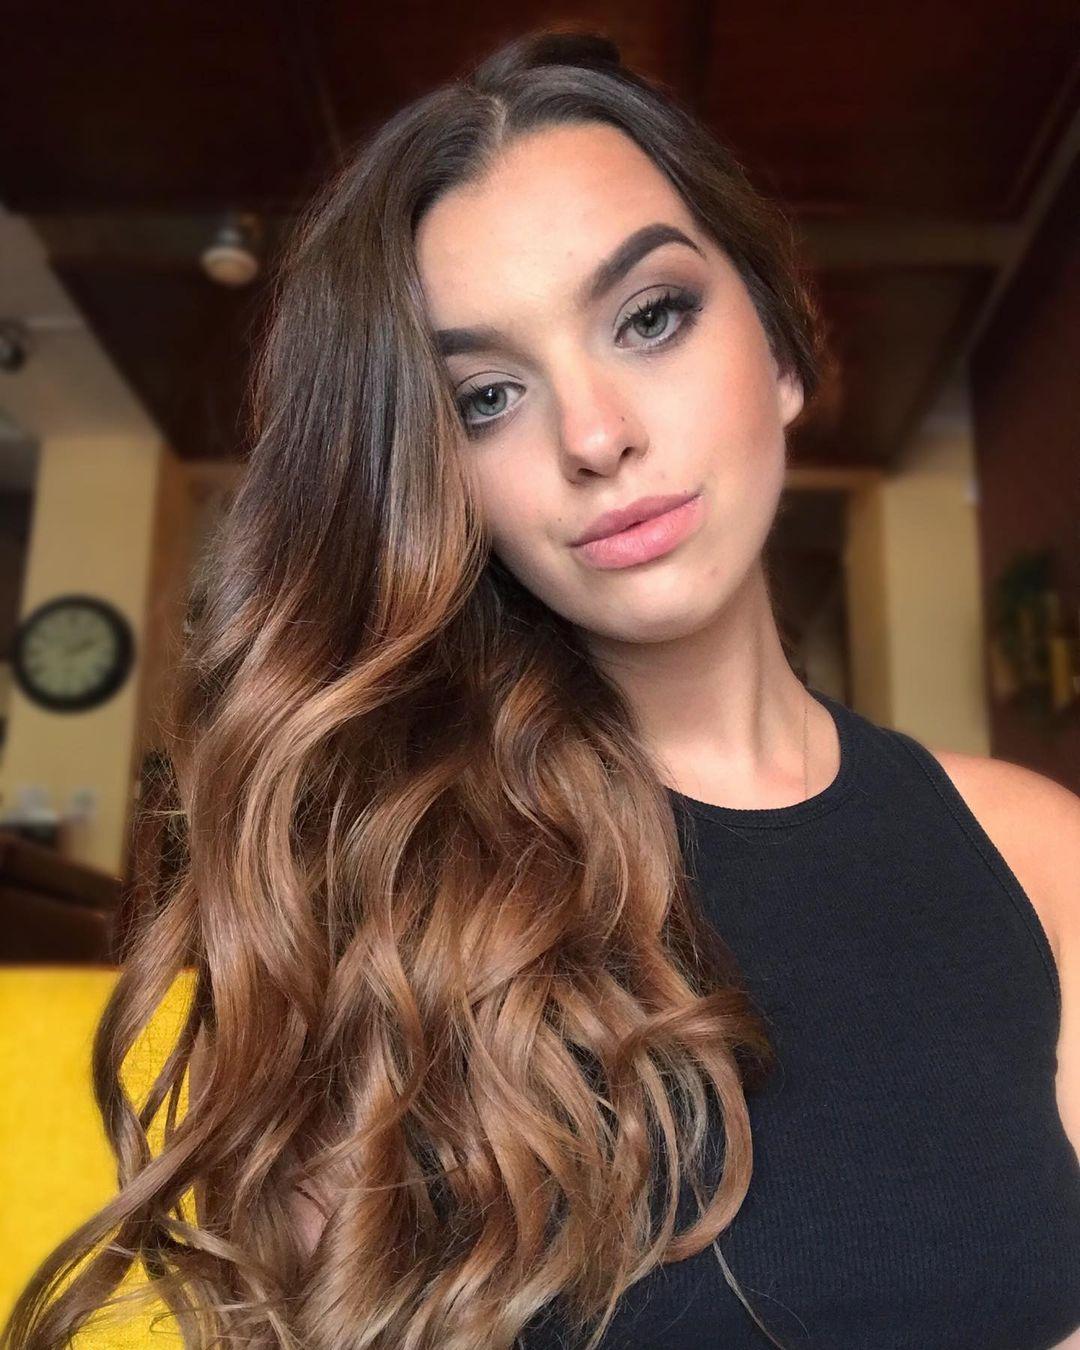 Laurencikova-Laura-Wallpapers-Insta-Fit-Bio-Laura-Laurencikova-Wallpapers-Insta-Fit-Bio-9